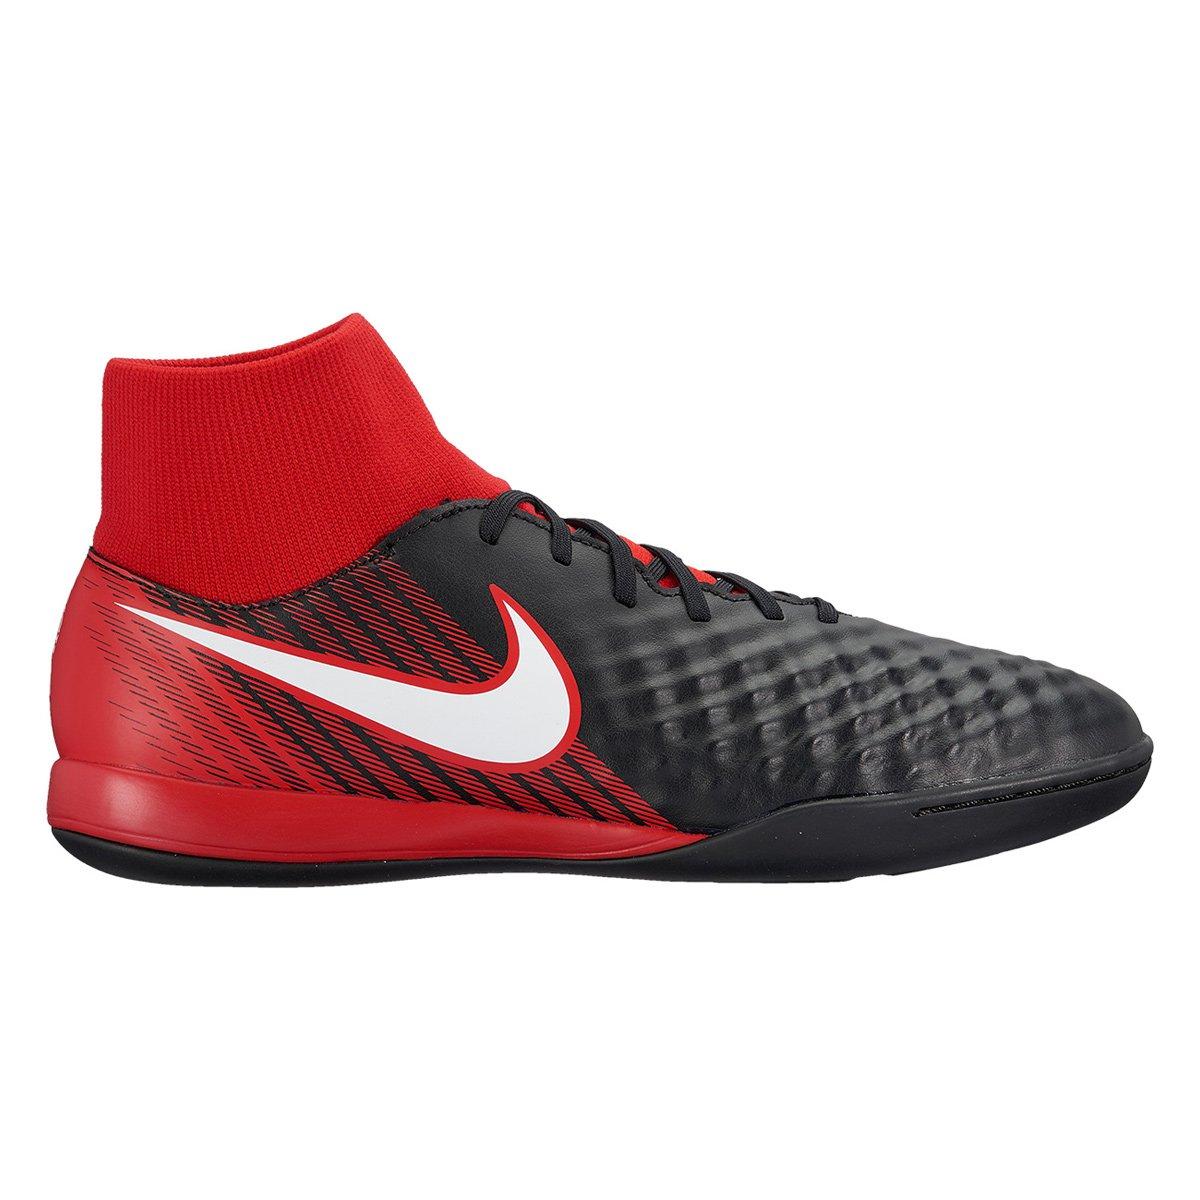 8dcc6fcda9 Chuteira Futsal Nike Magista Onda 2 DF IC - Compre Agora